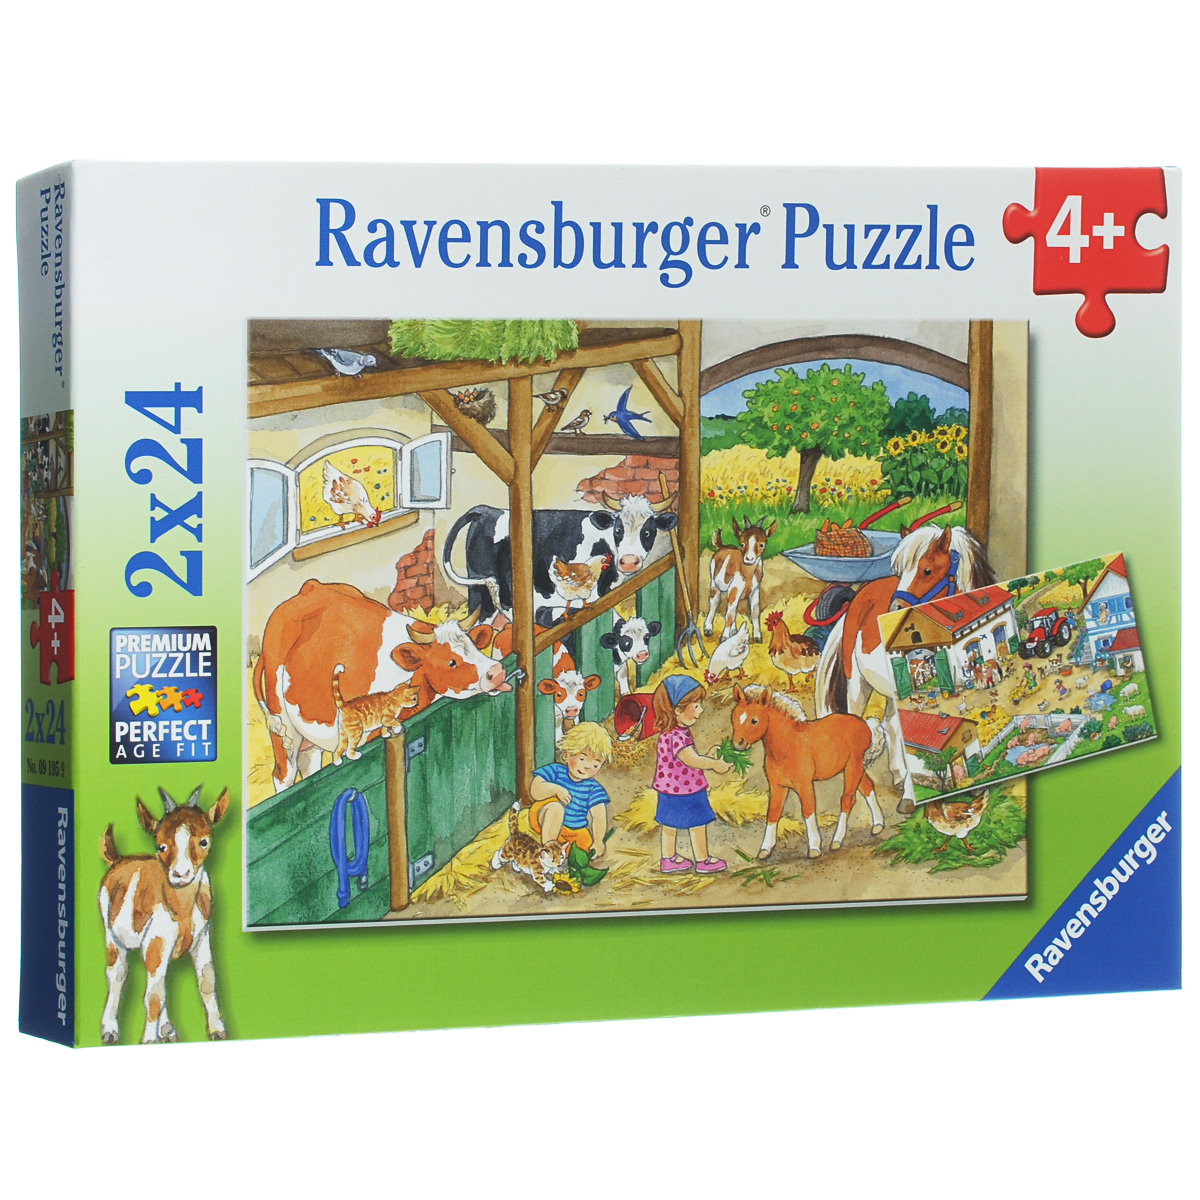 Ravensburger День на ферме. Пазл, 2 х 24 элемента ravensburger подводный мир пазл 5000 элементов